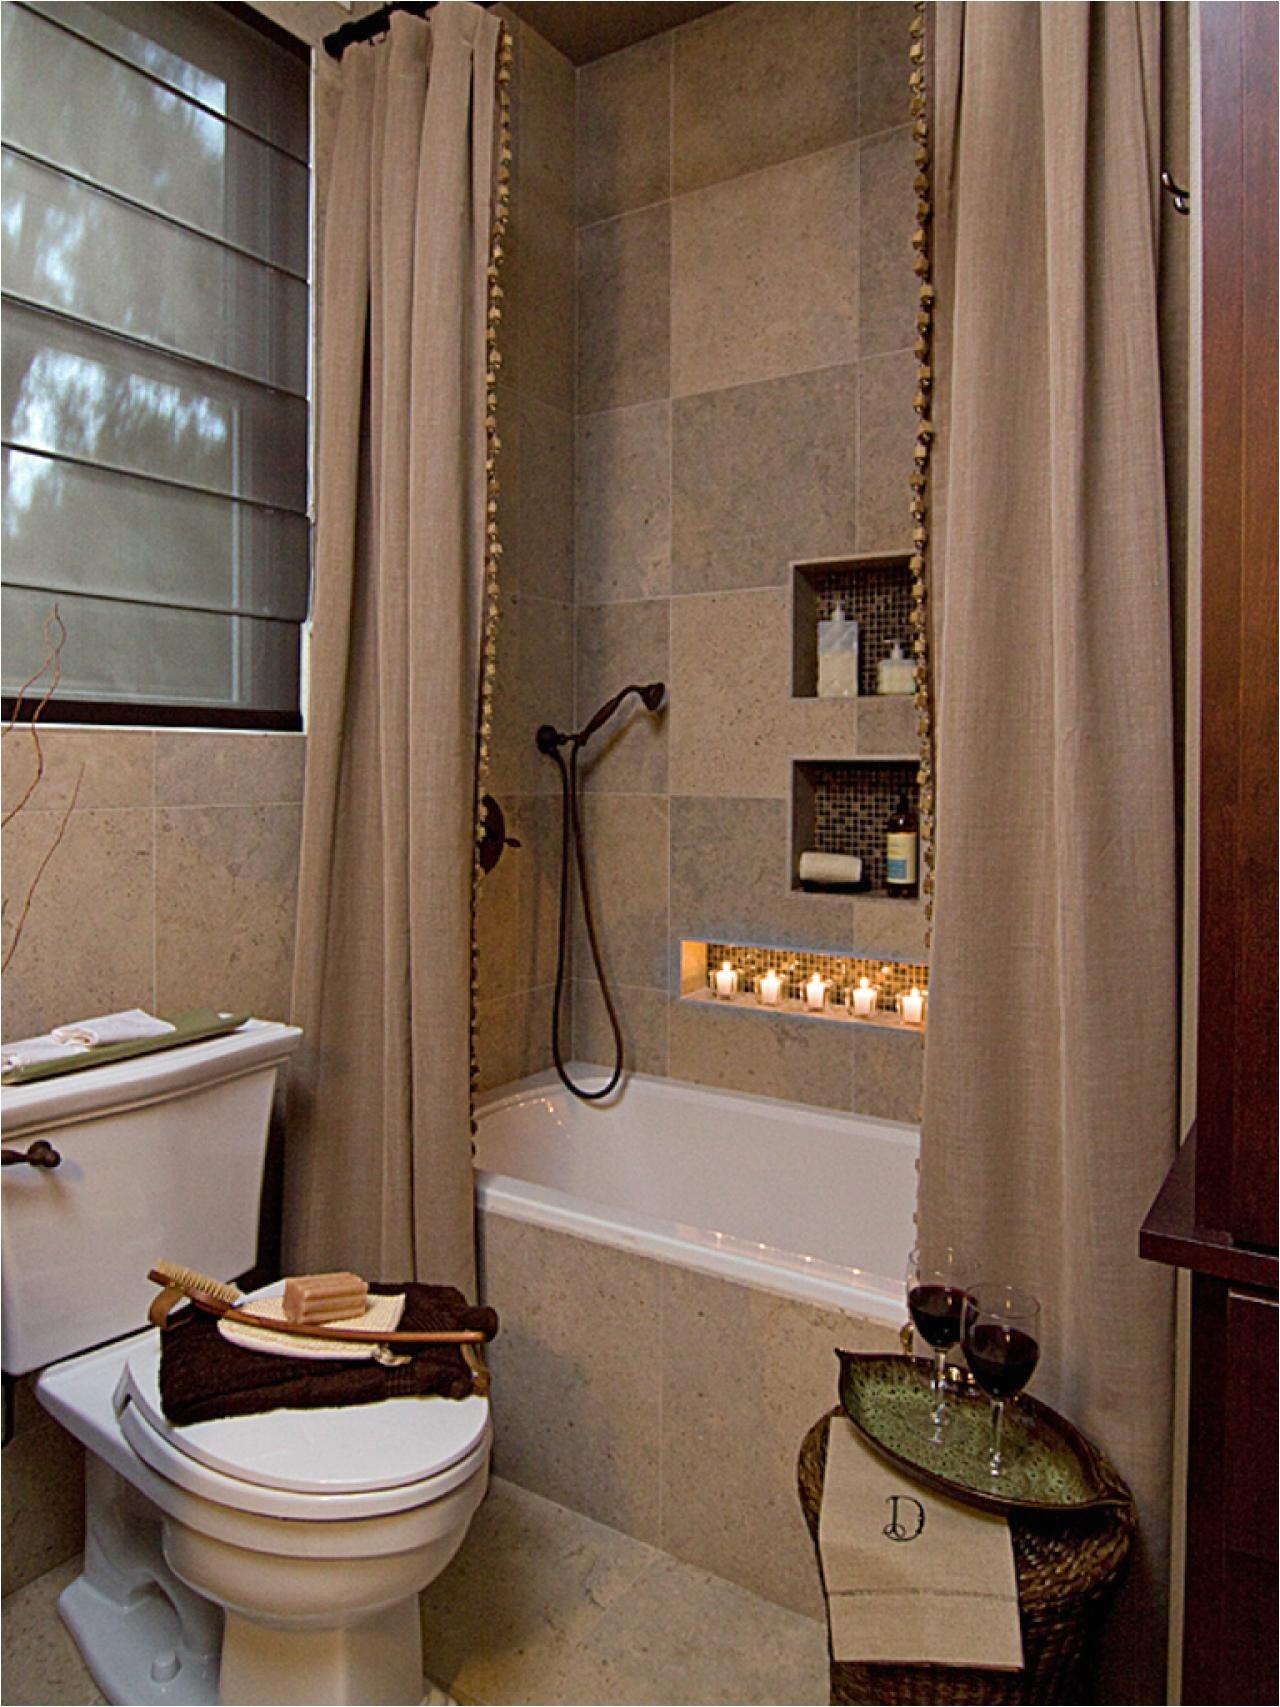 Bathroom 99 Stylish Design Ideas You ll Love Bathroom Ideas & Design with Vanities Tile Cabinets